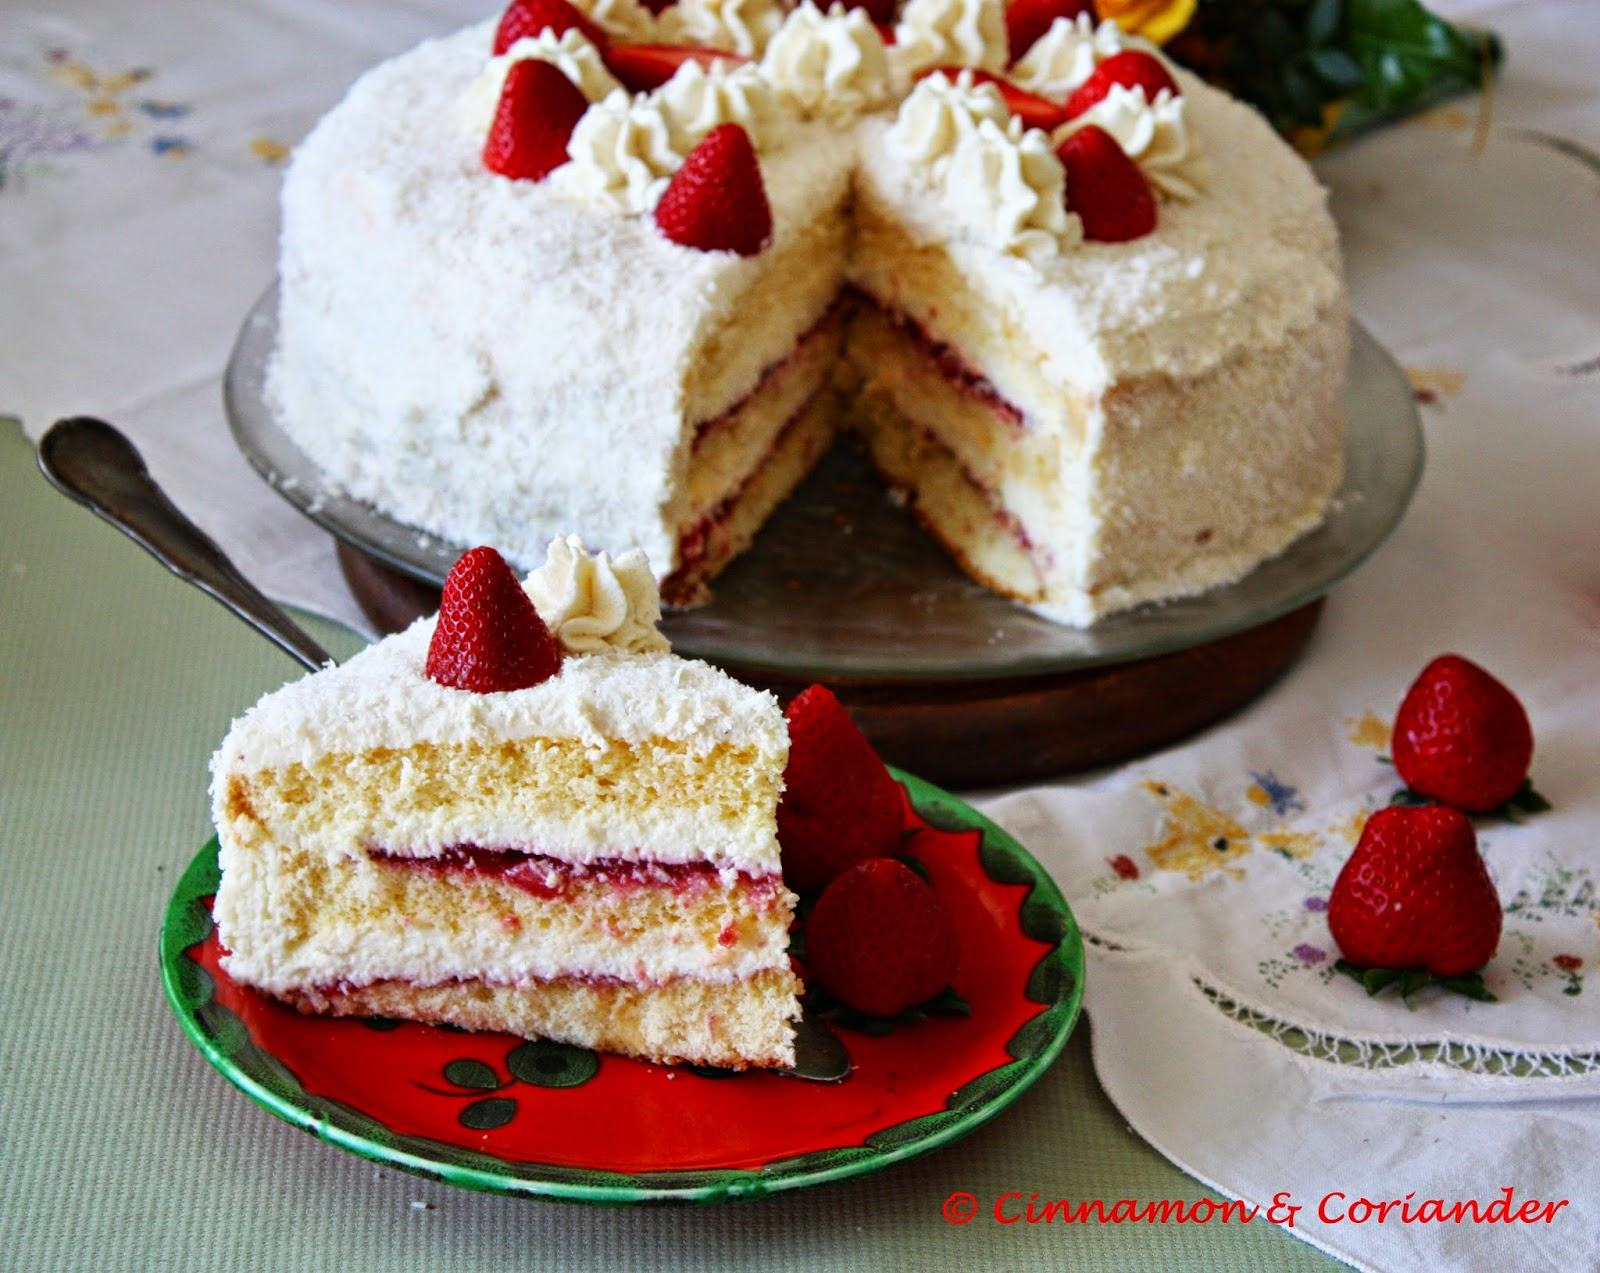 Erdbeer Kokos Torte Mit Schoko Mascarpone Creme Cinnamon Coriander